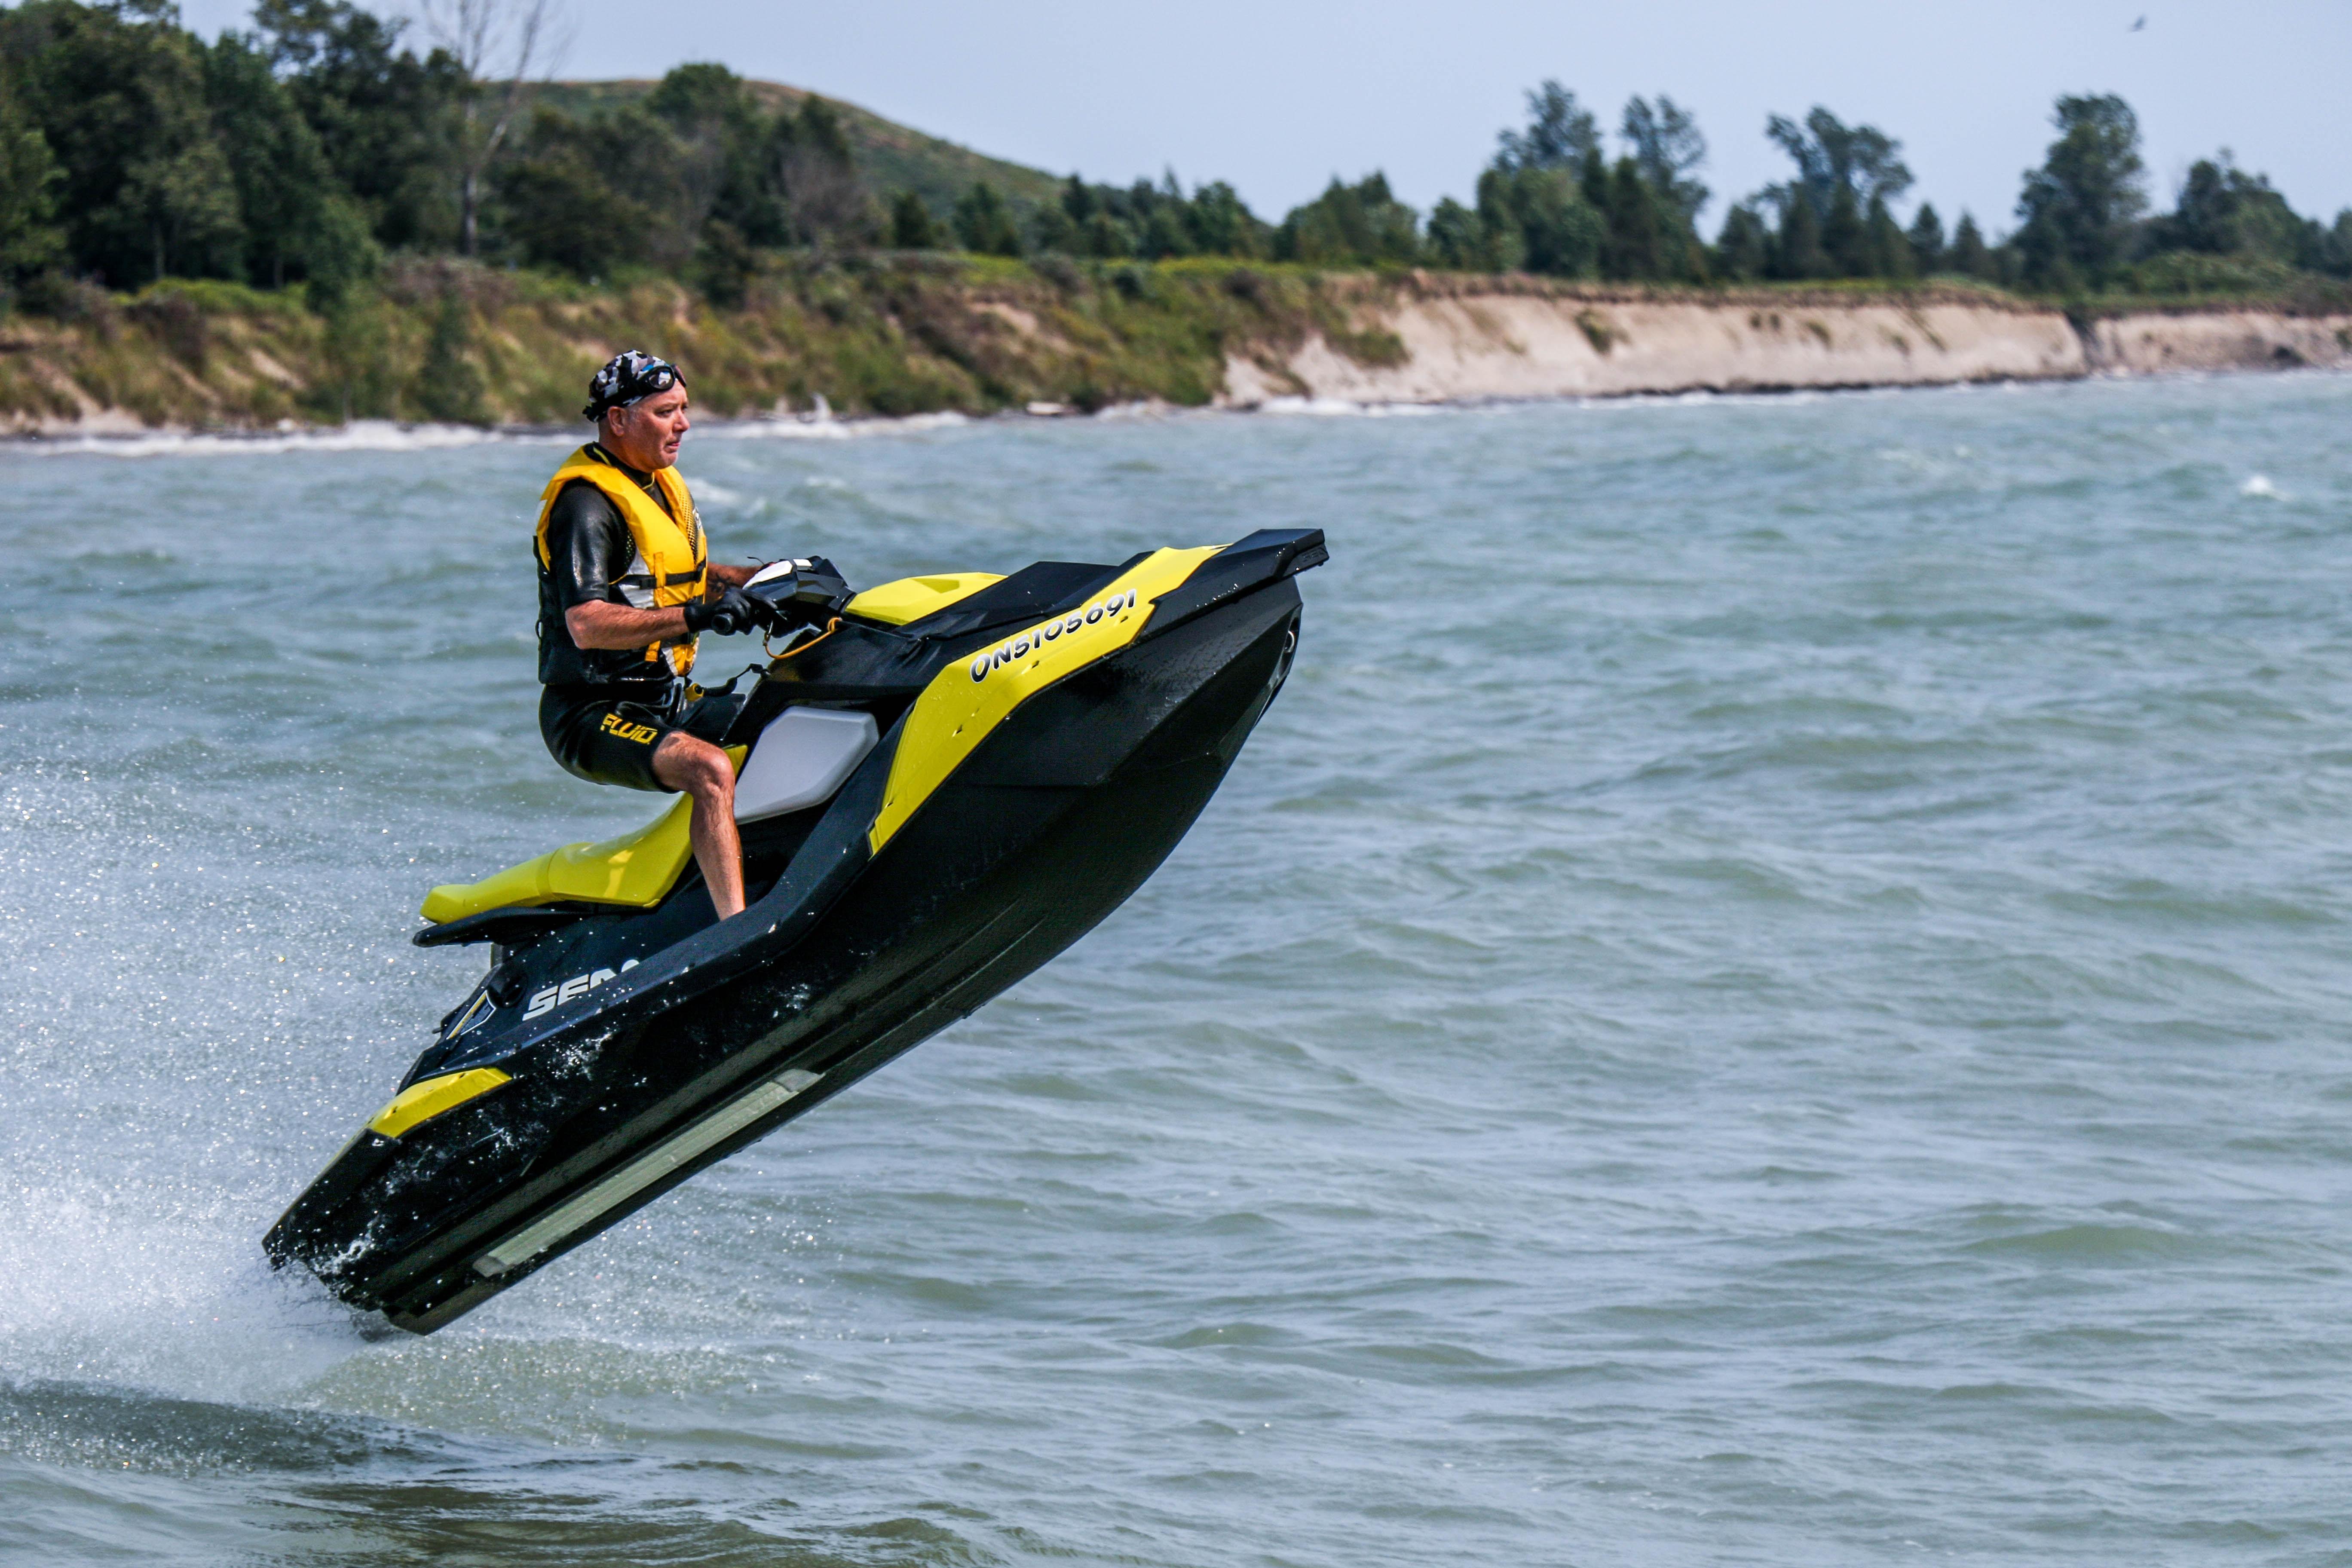 man riding personal watercraft